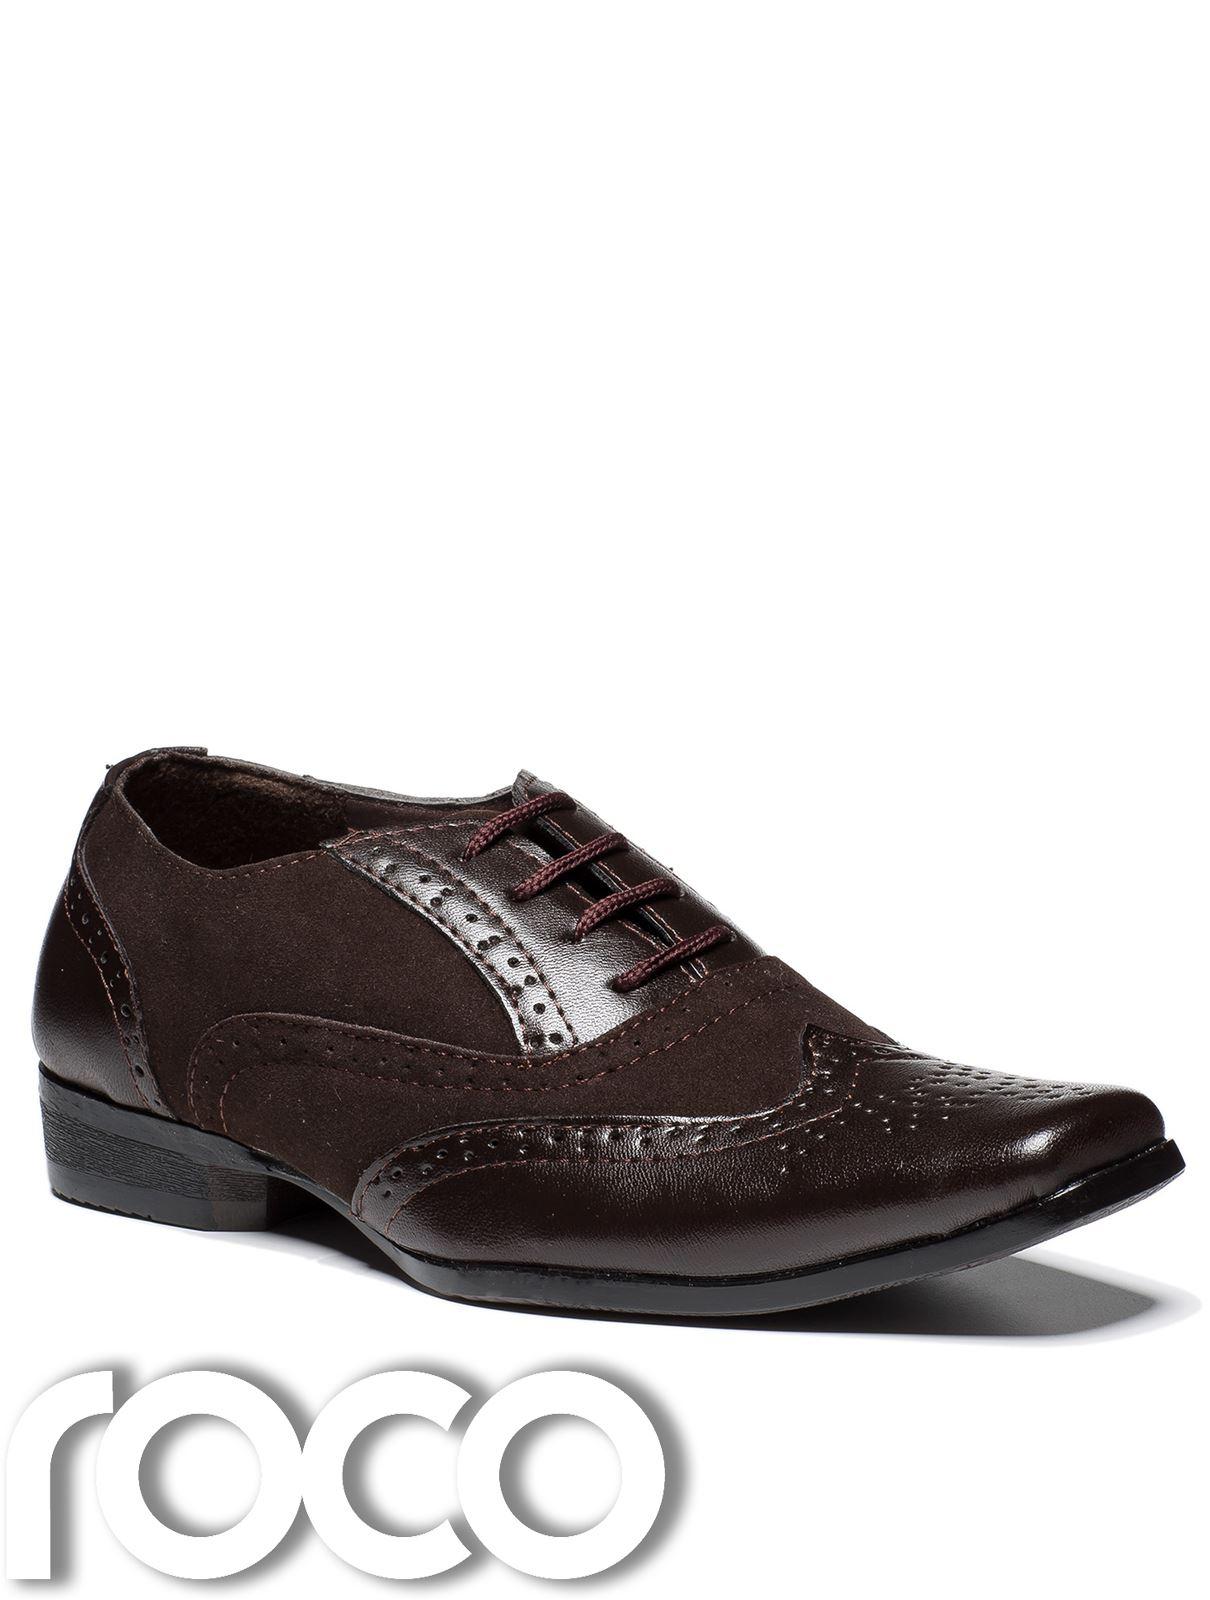 boys brown shoes boys black shoes boys brogues formal